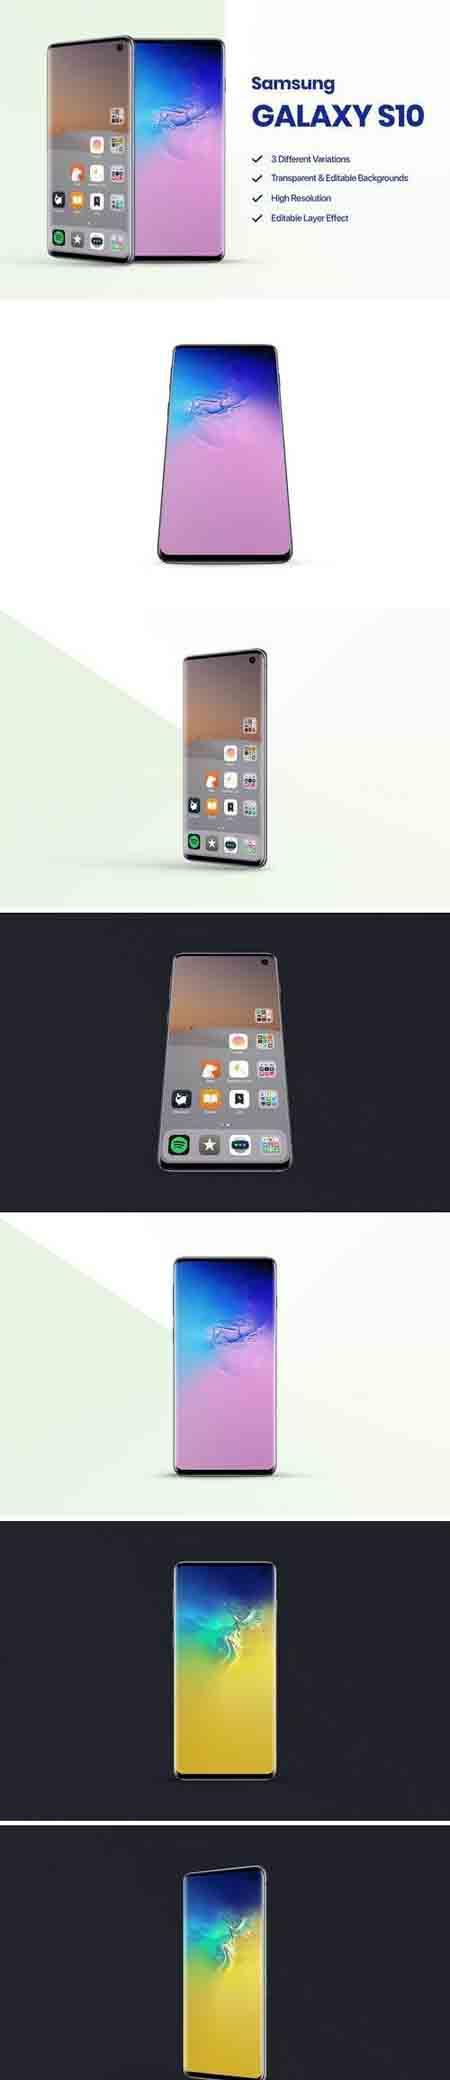 全新发布的三星Galaxy S10样机1.0 Samsung Galaxy S10 Mockup 1.0插图